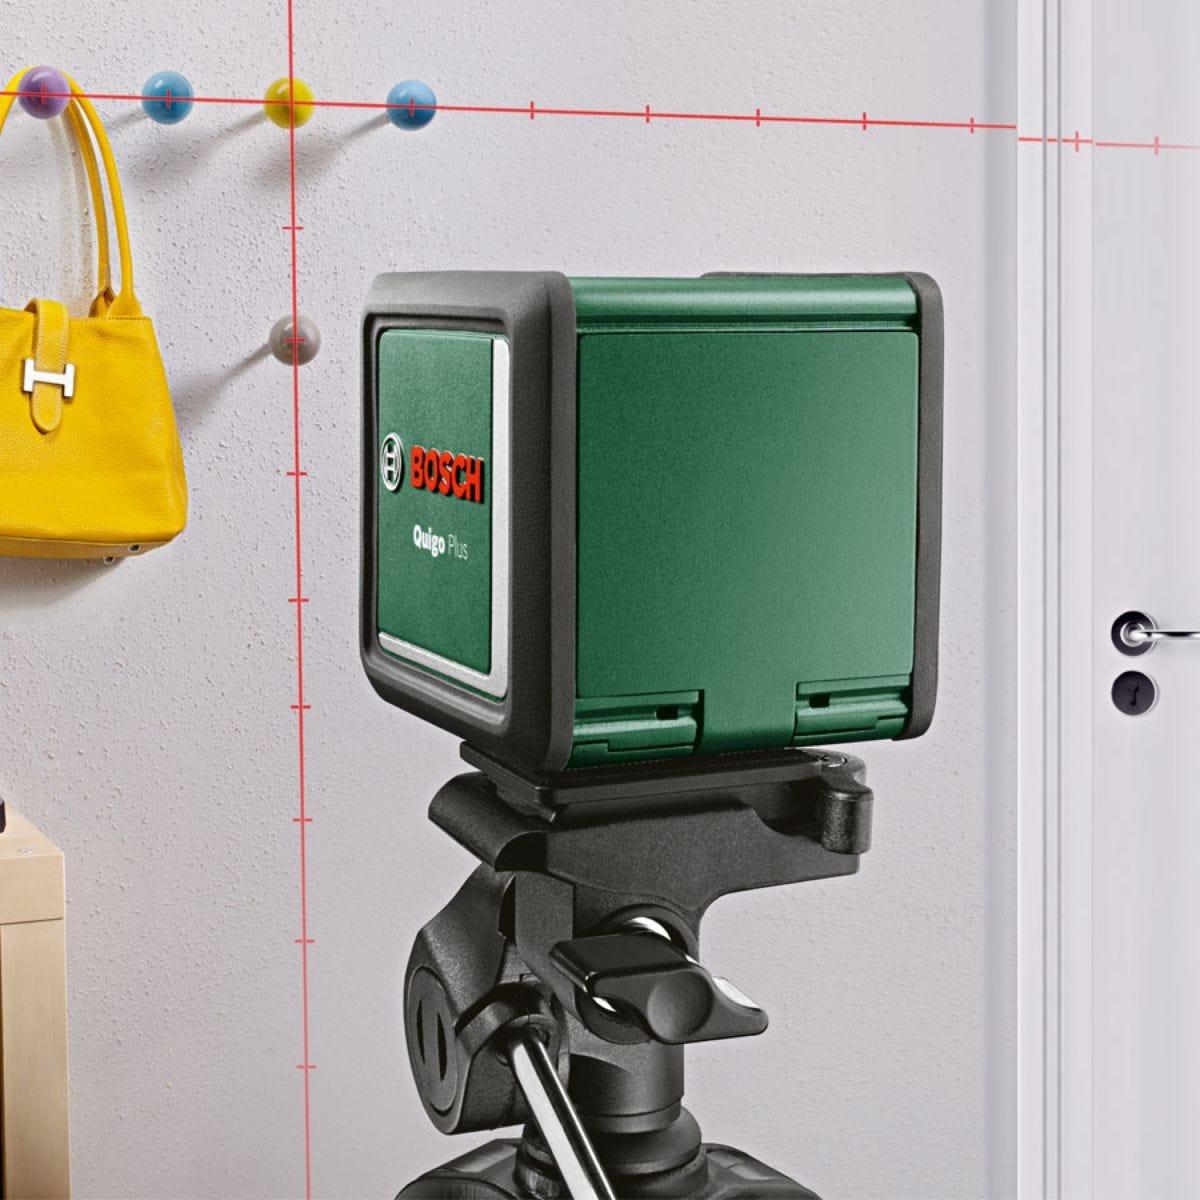 Bosch Quigo Plus Cross Line Laser with Tripod